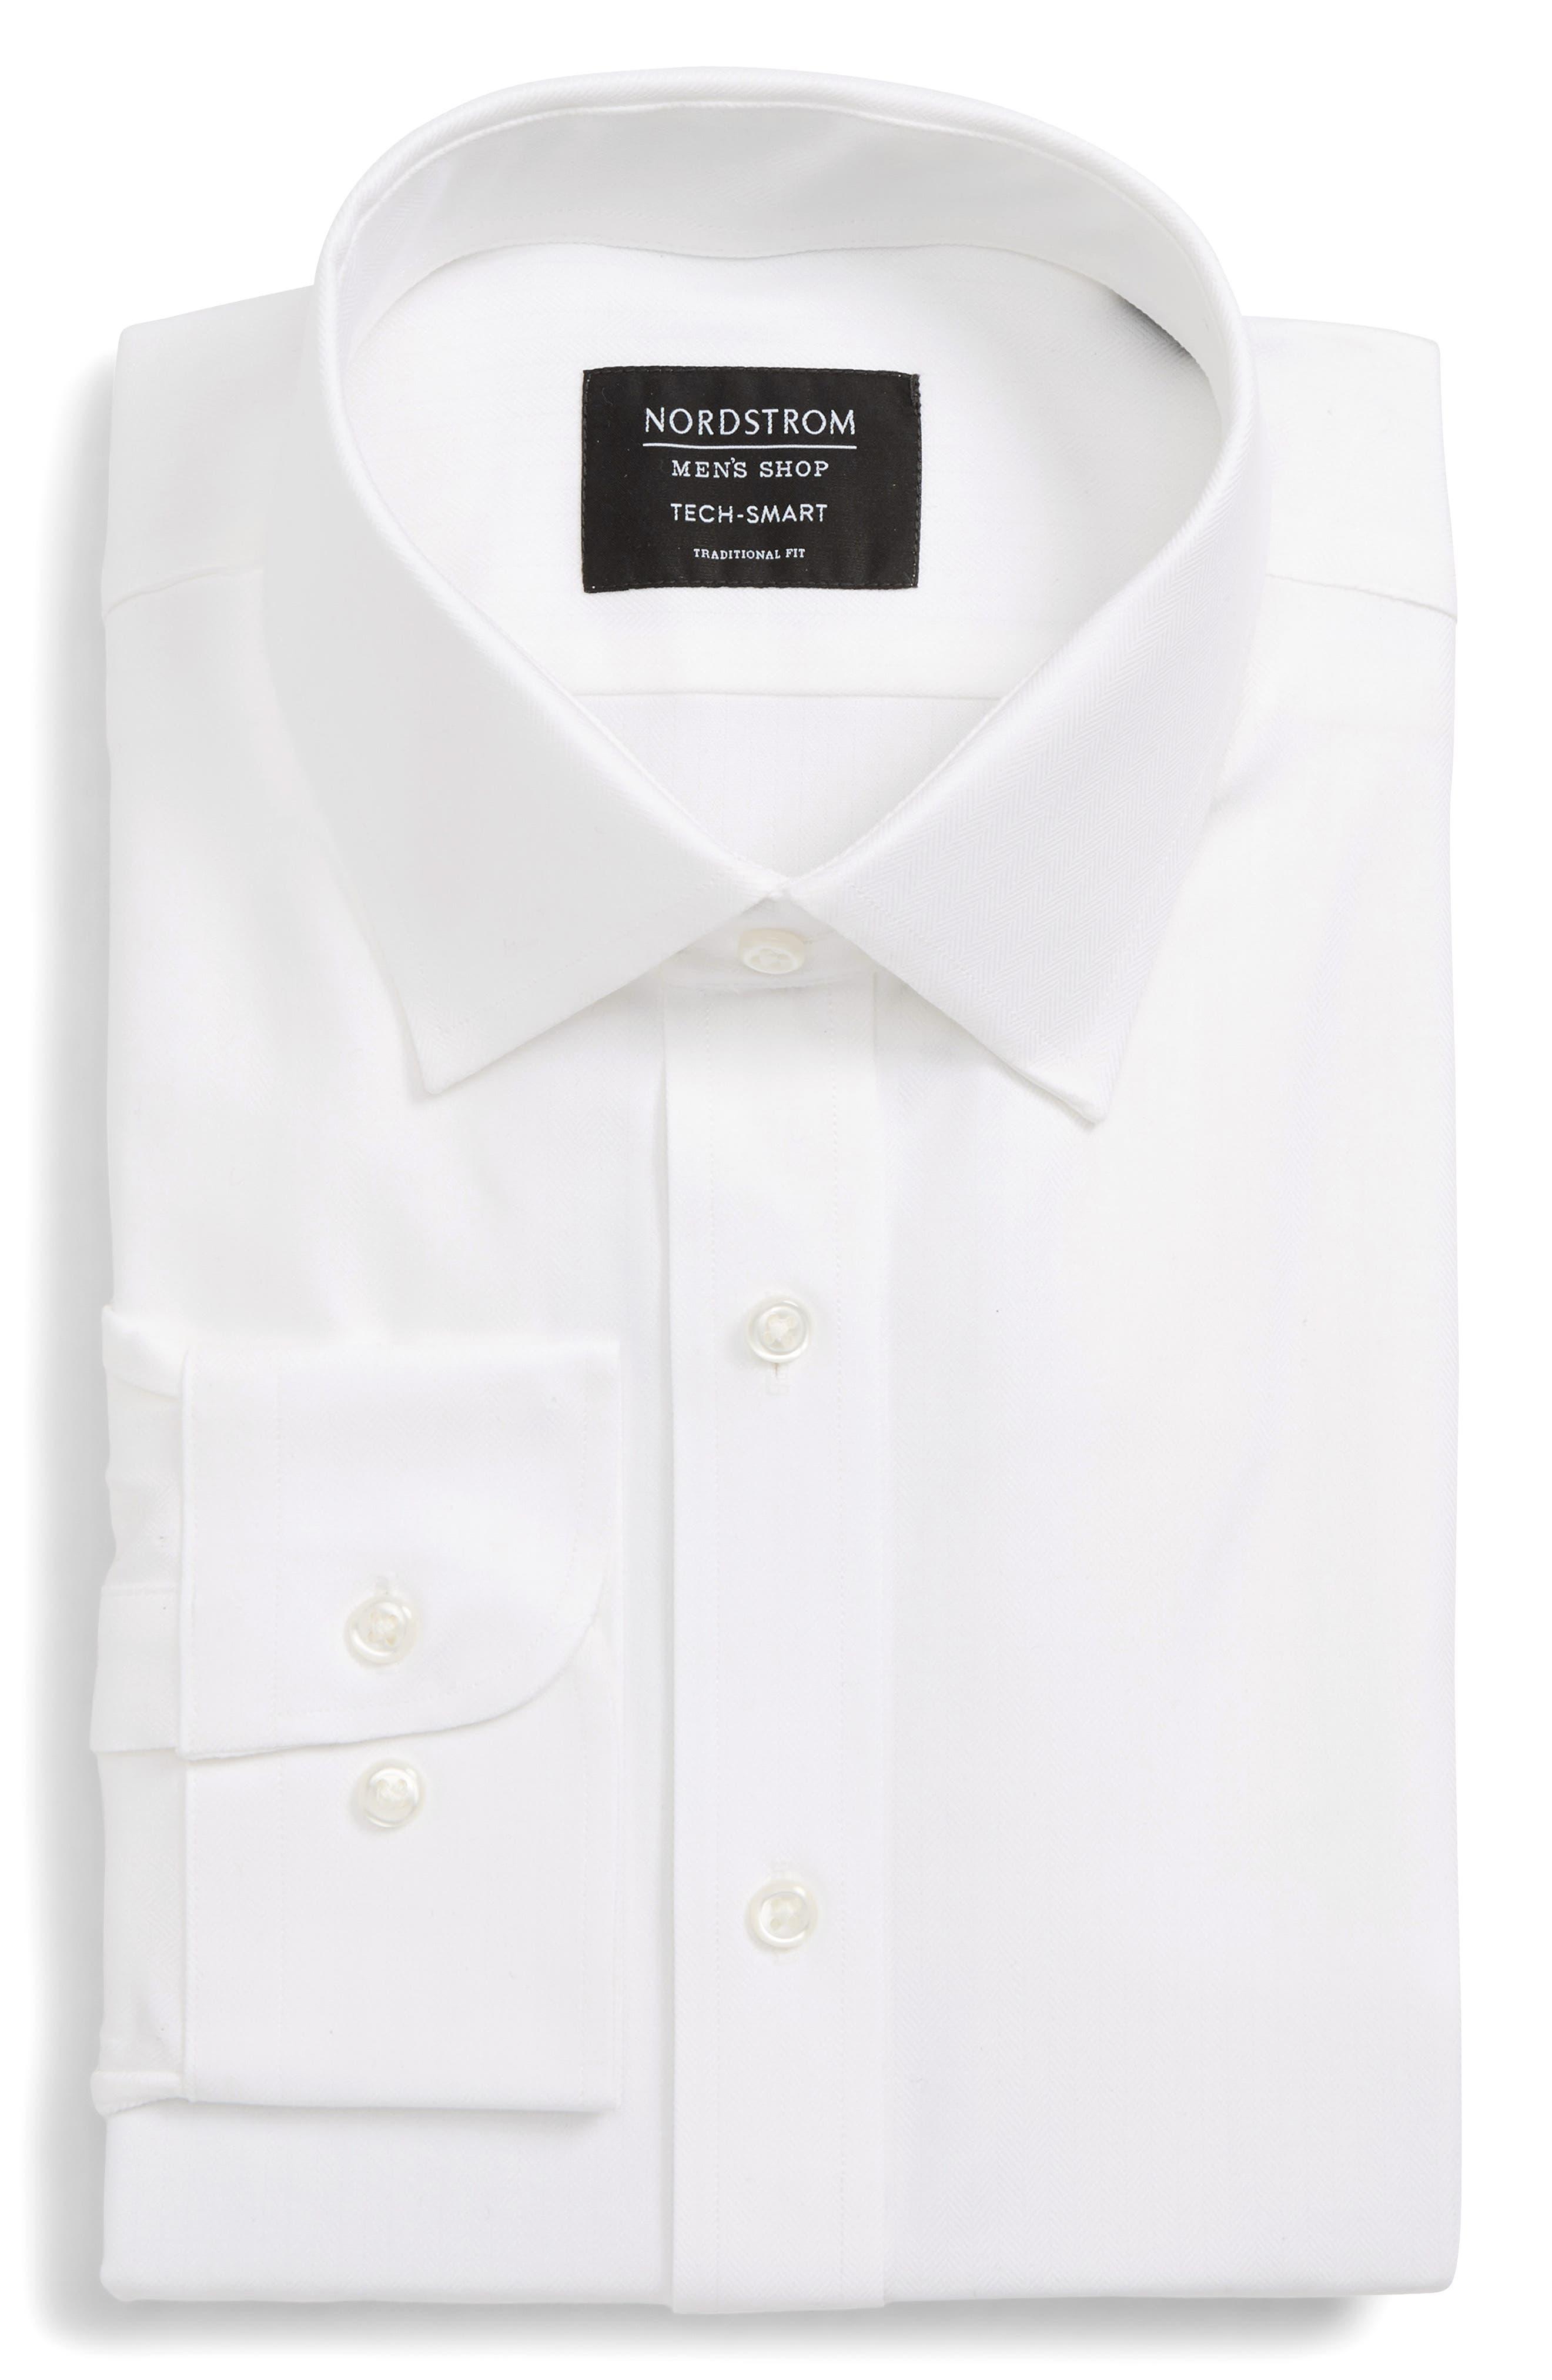 NORDSTROM MEN'S SHOP, Tech-Smart Traditional Fit Stretch Herringbone Dress Shirt, Alternate thumbnail 5, color, WHITE